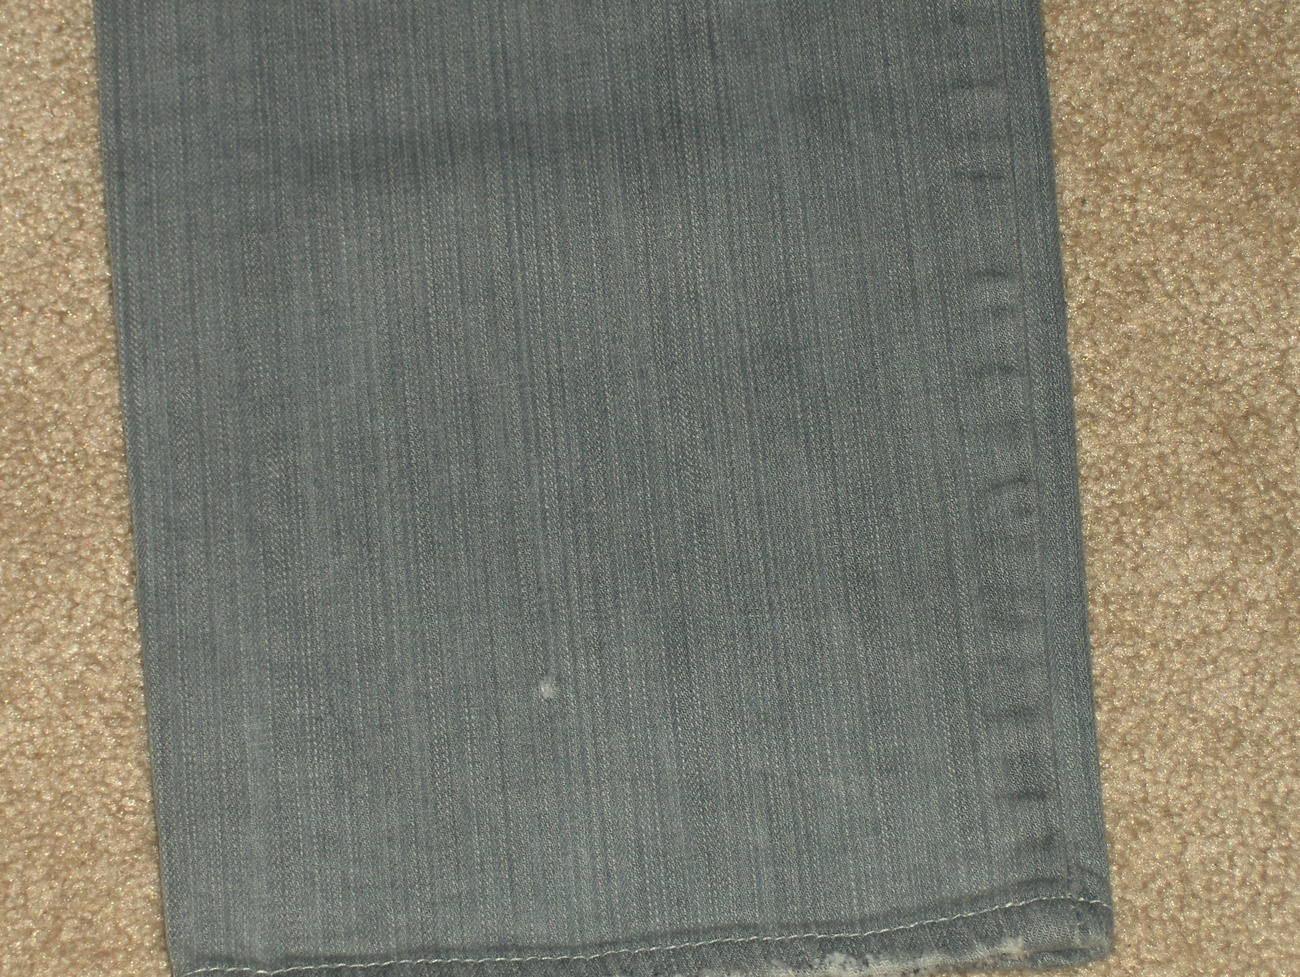 Bitten Sarah Jessica Parker Blue Jeans 22S